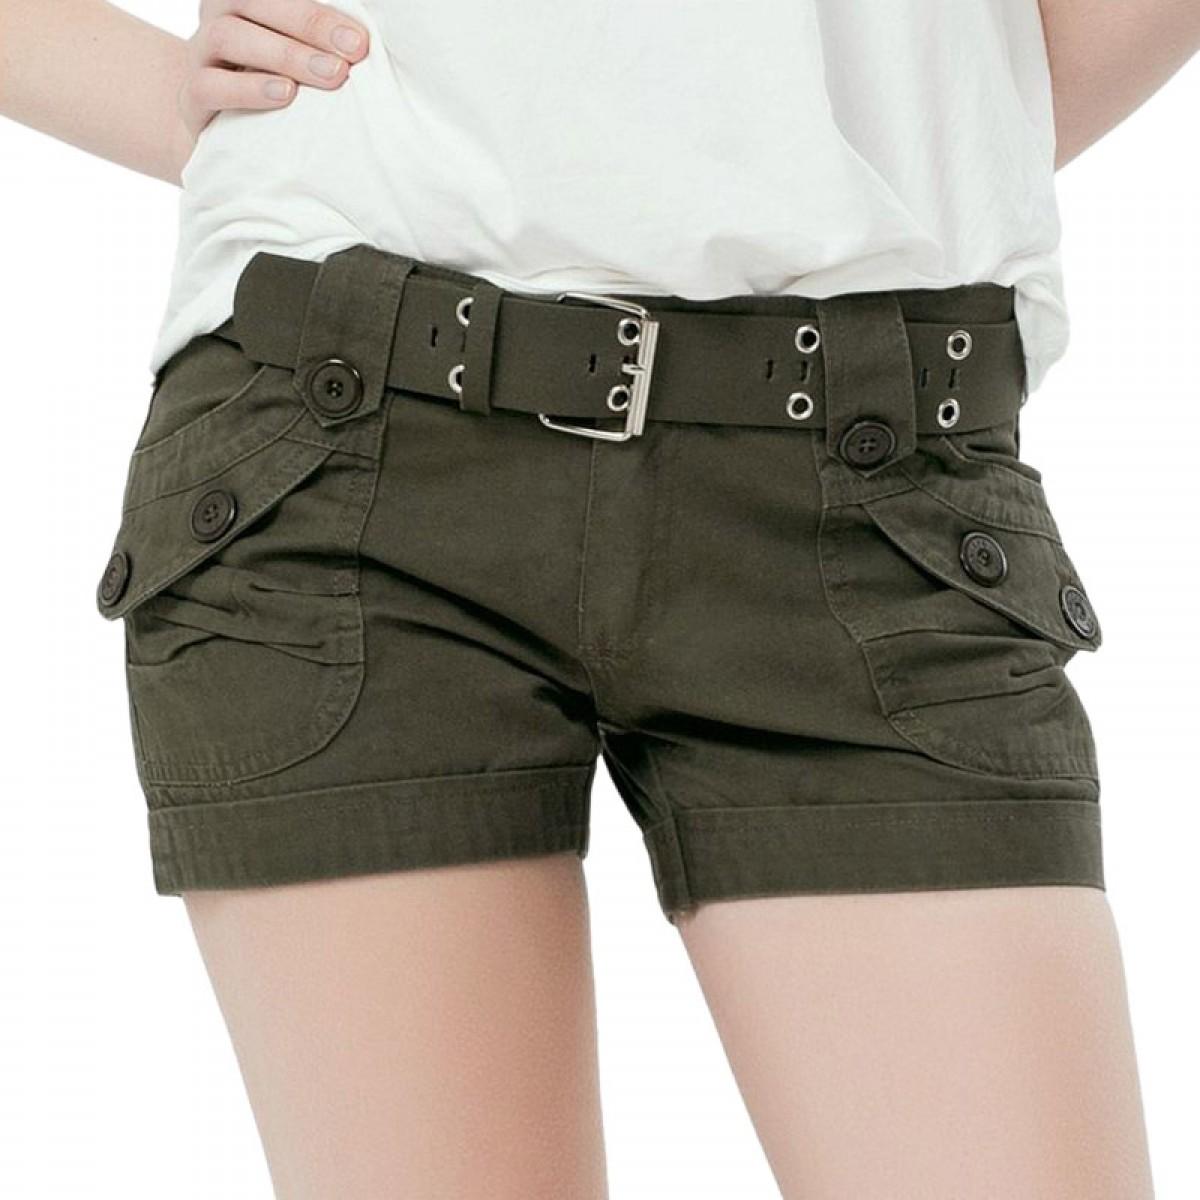 Cargo shorts women